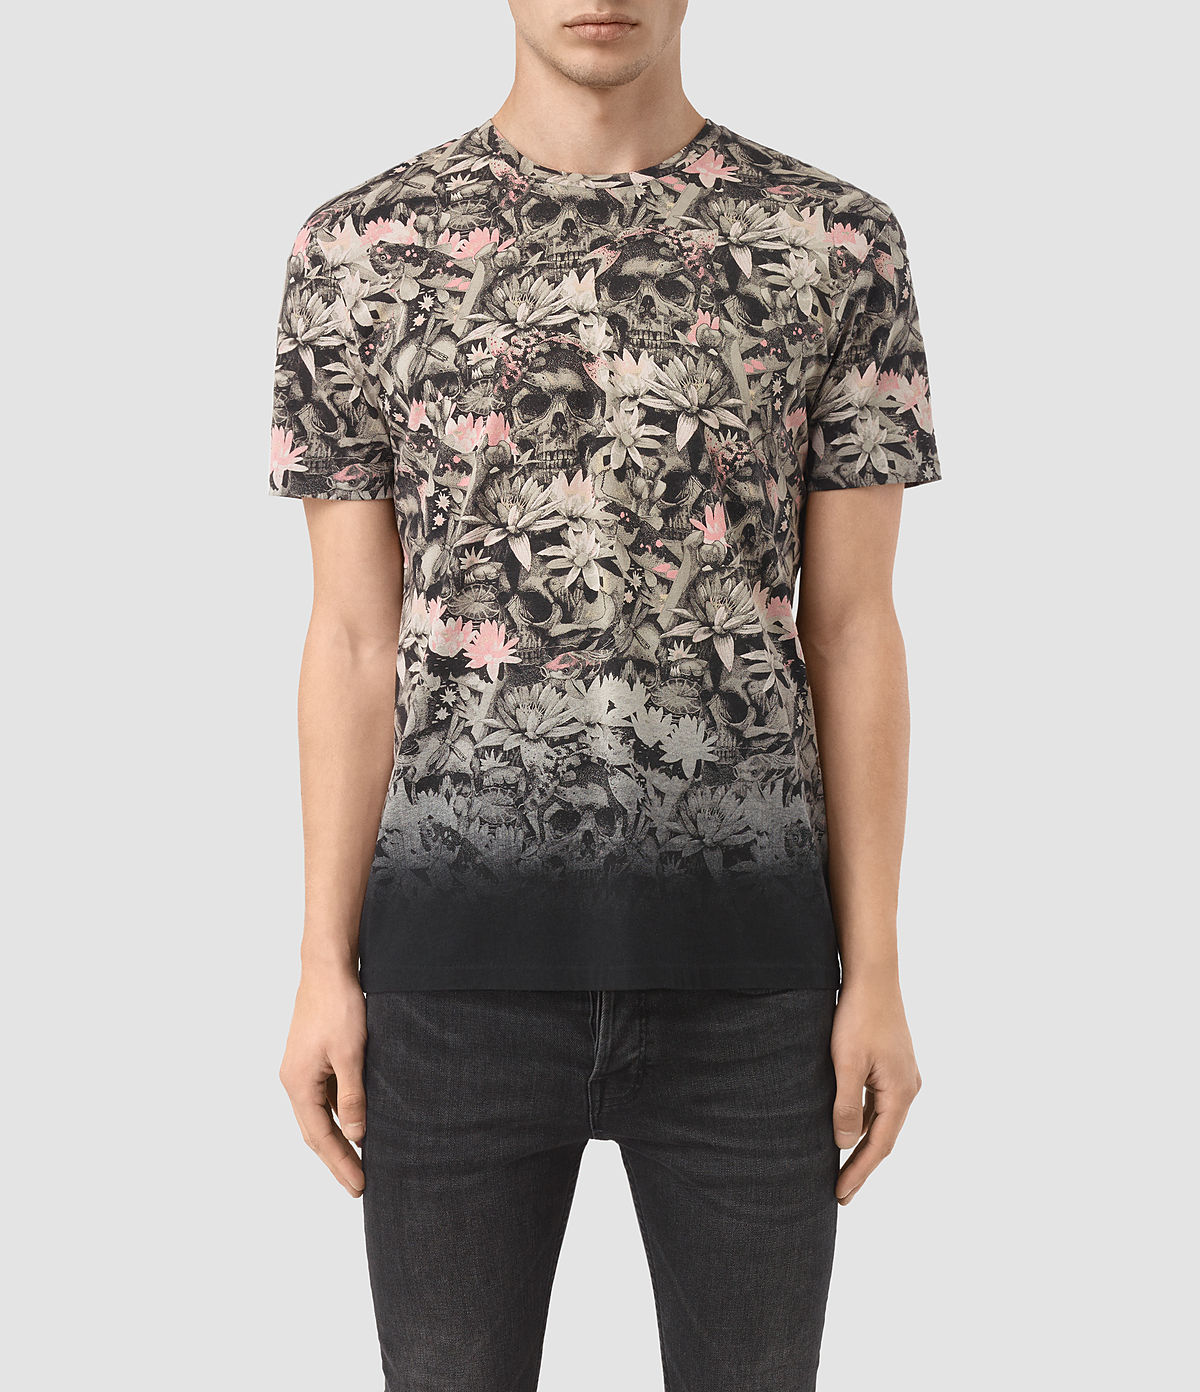 pond-crew-t-shirt